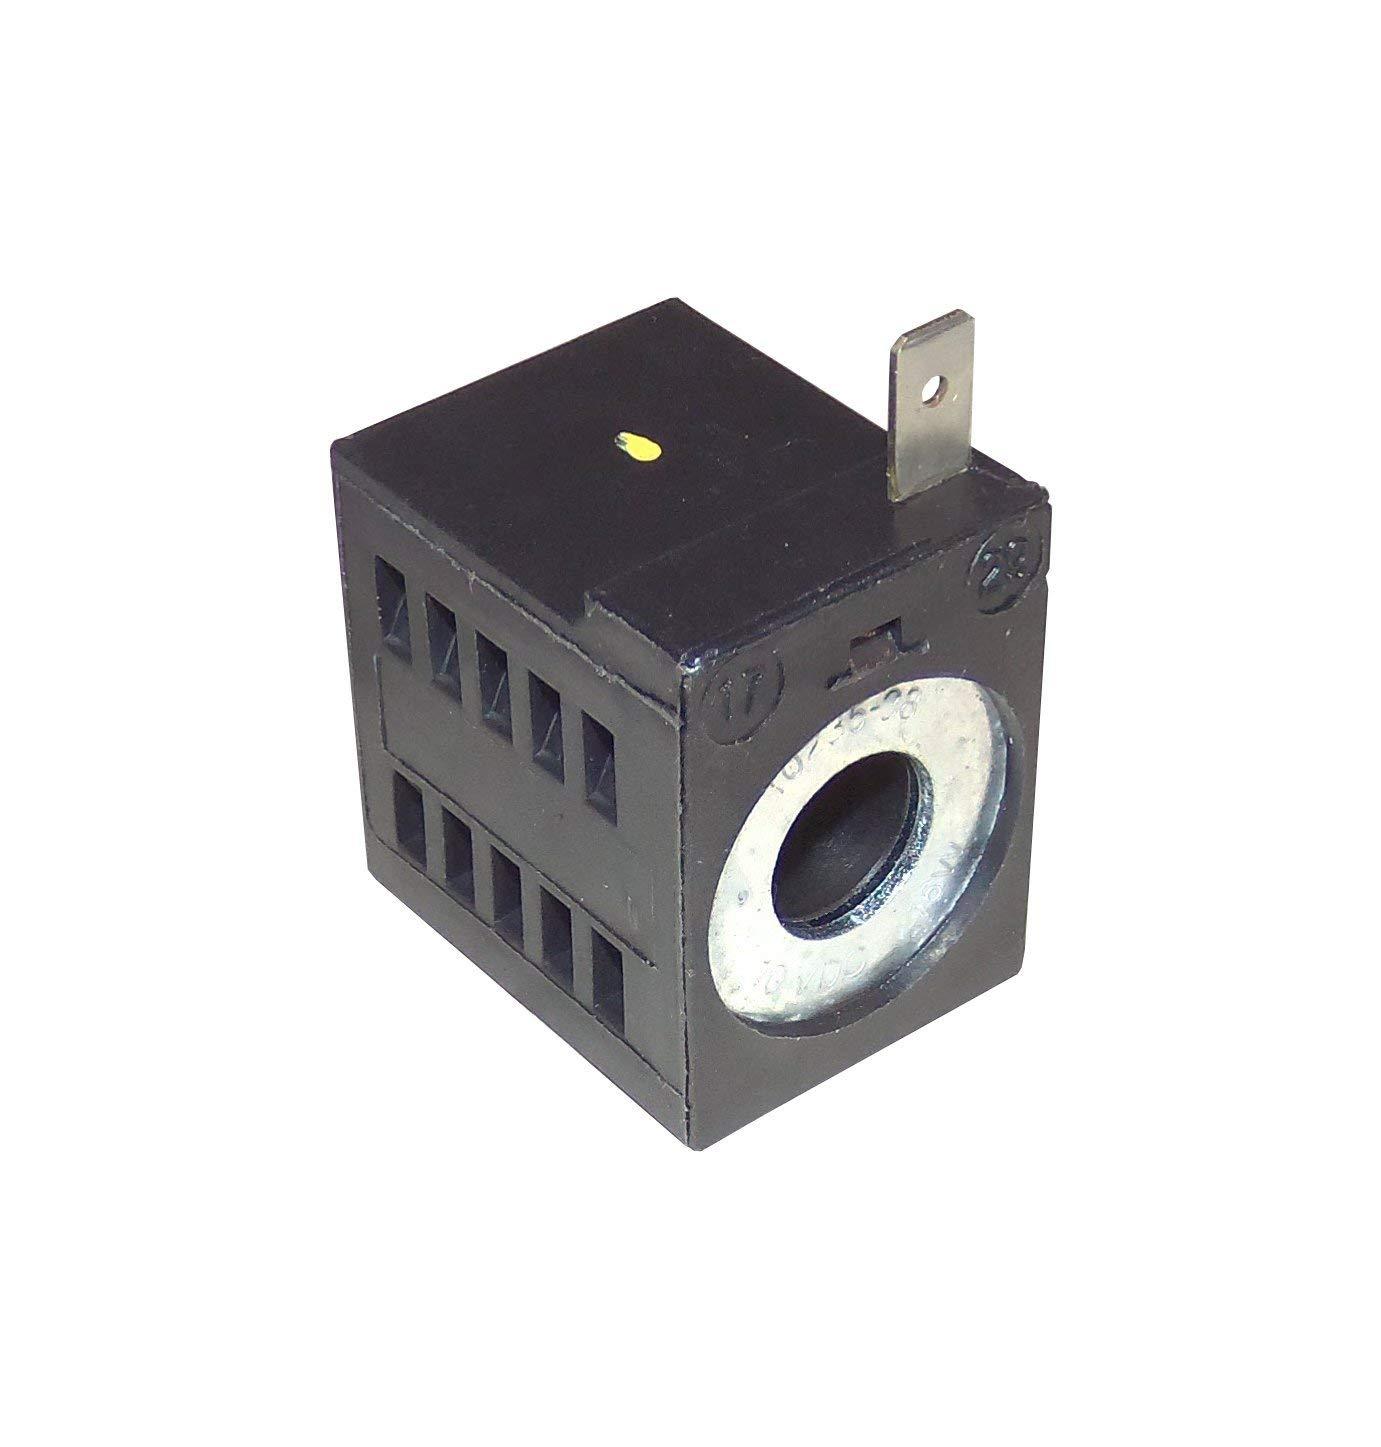 Deltrol 10235-38 10VDC Solenoid Coil 16W, Single Stud